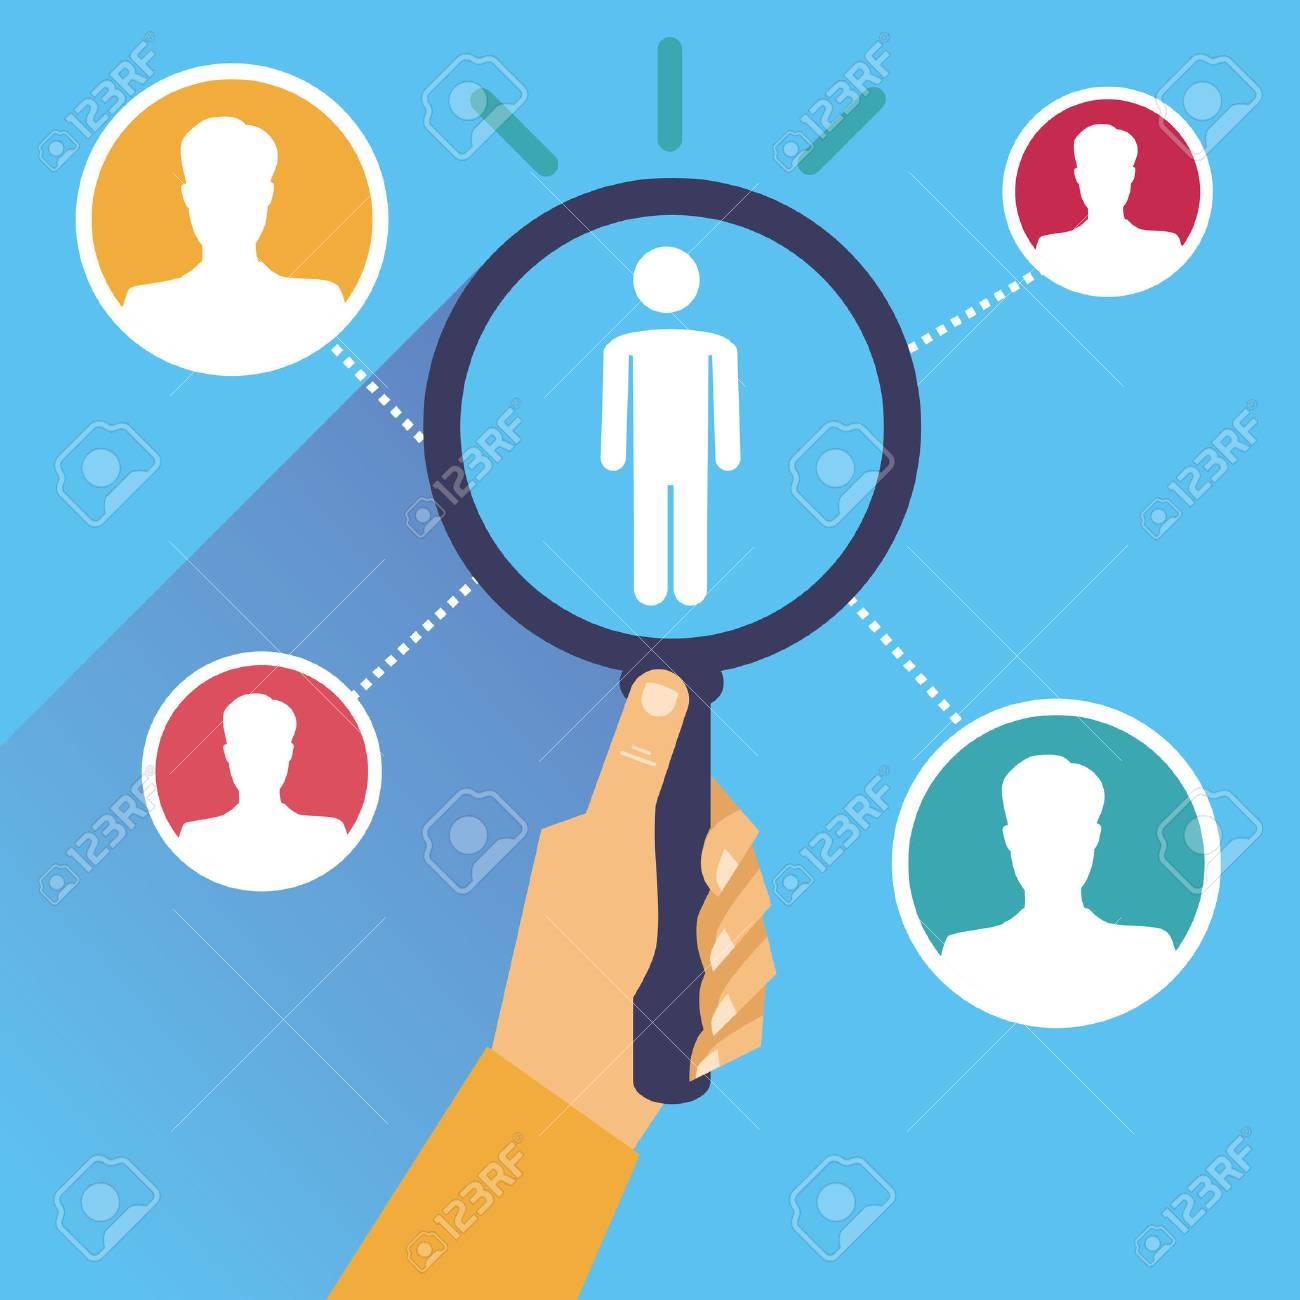 Human Resources Vector Human Resources Vector Human